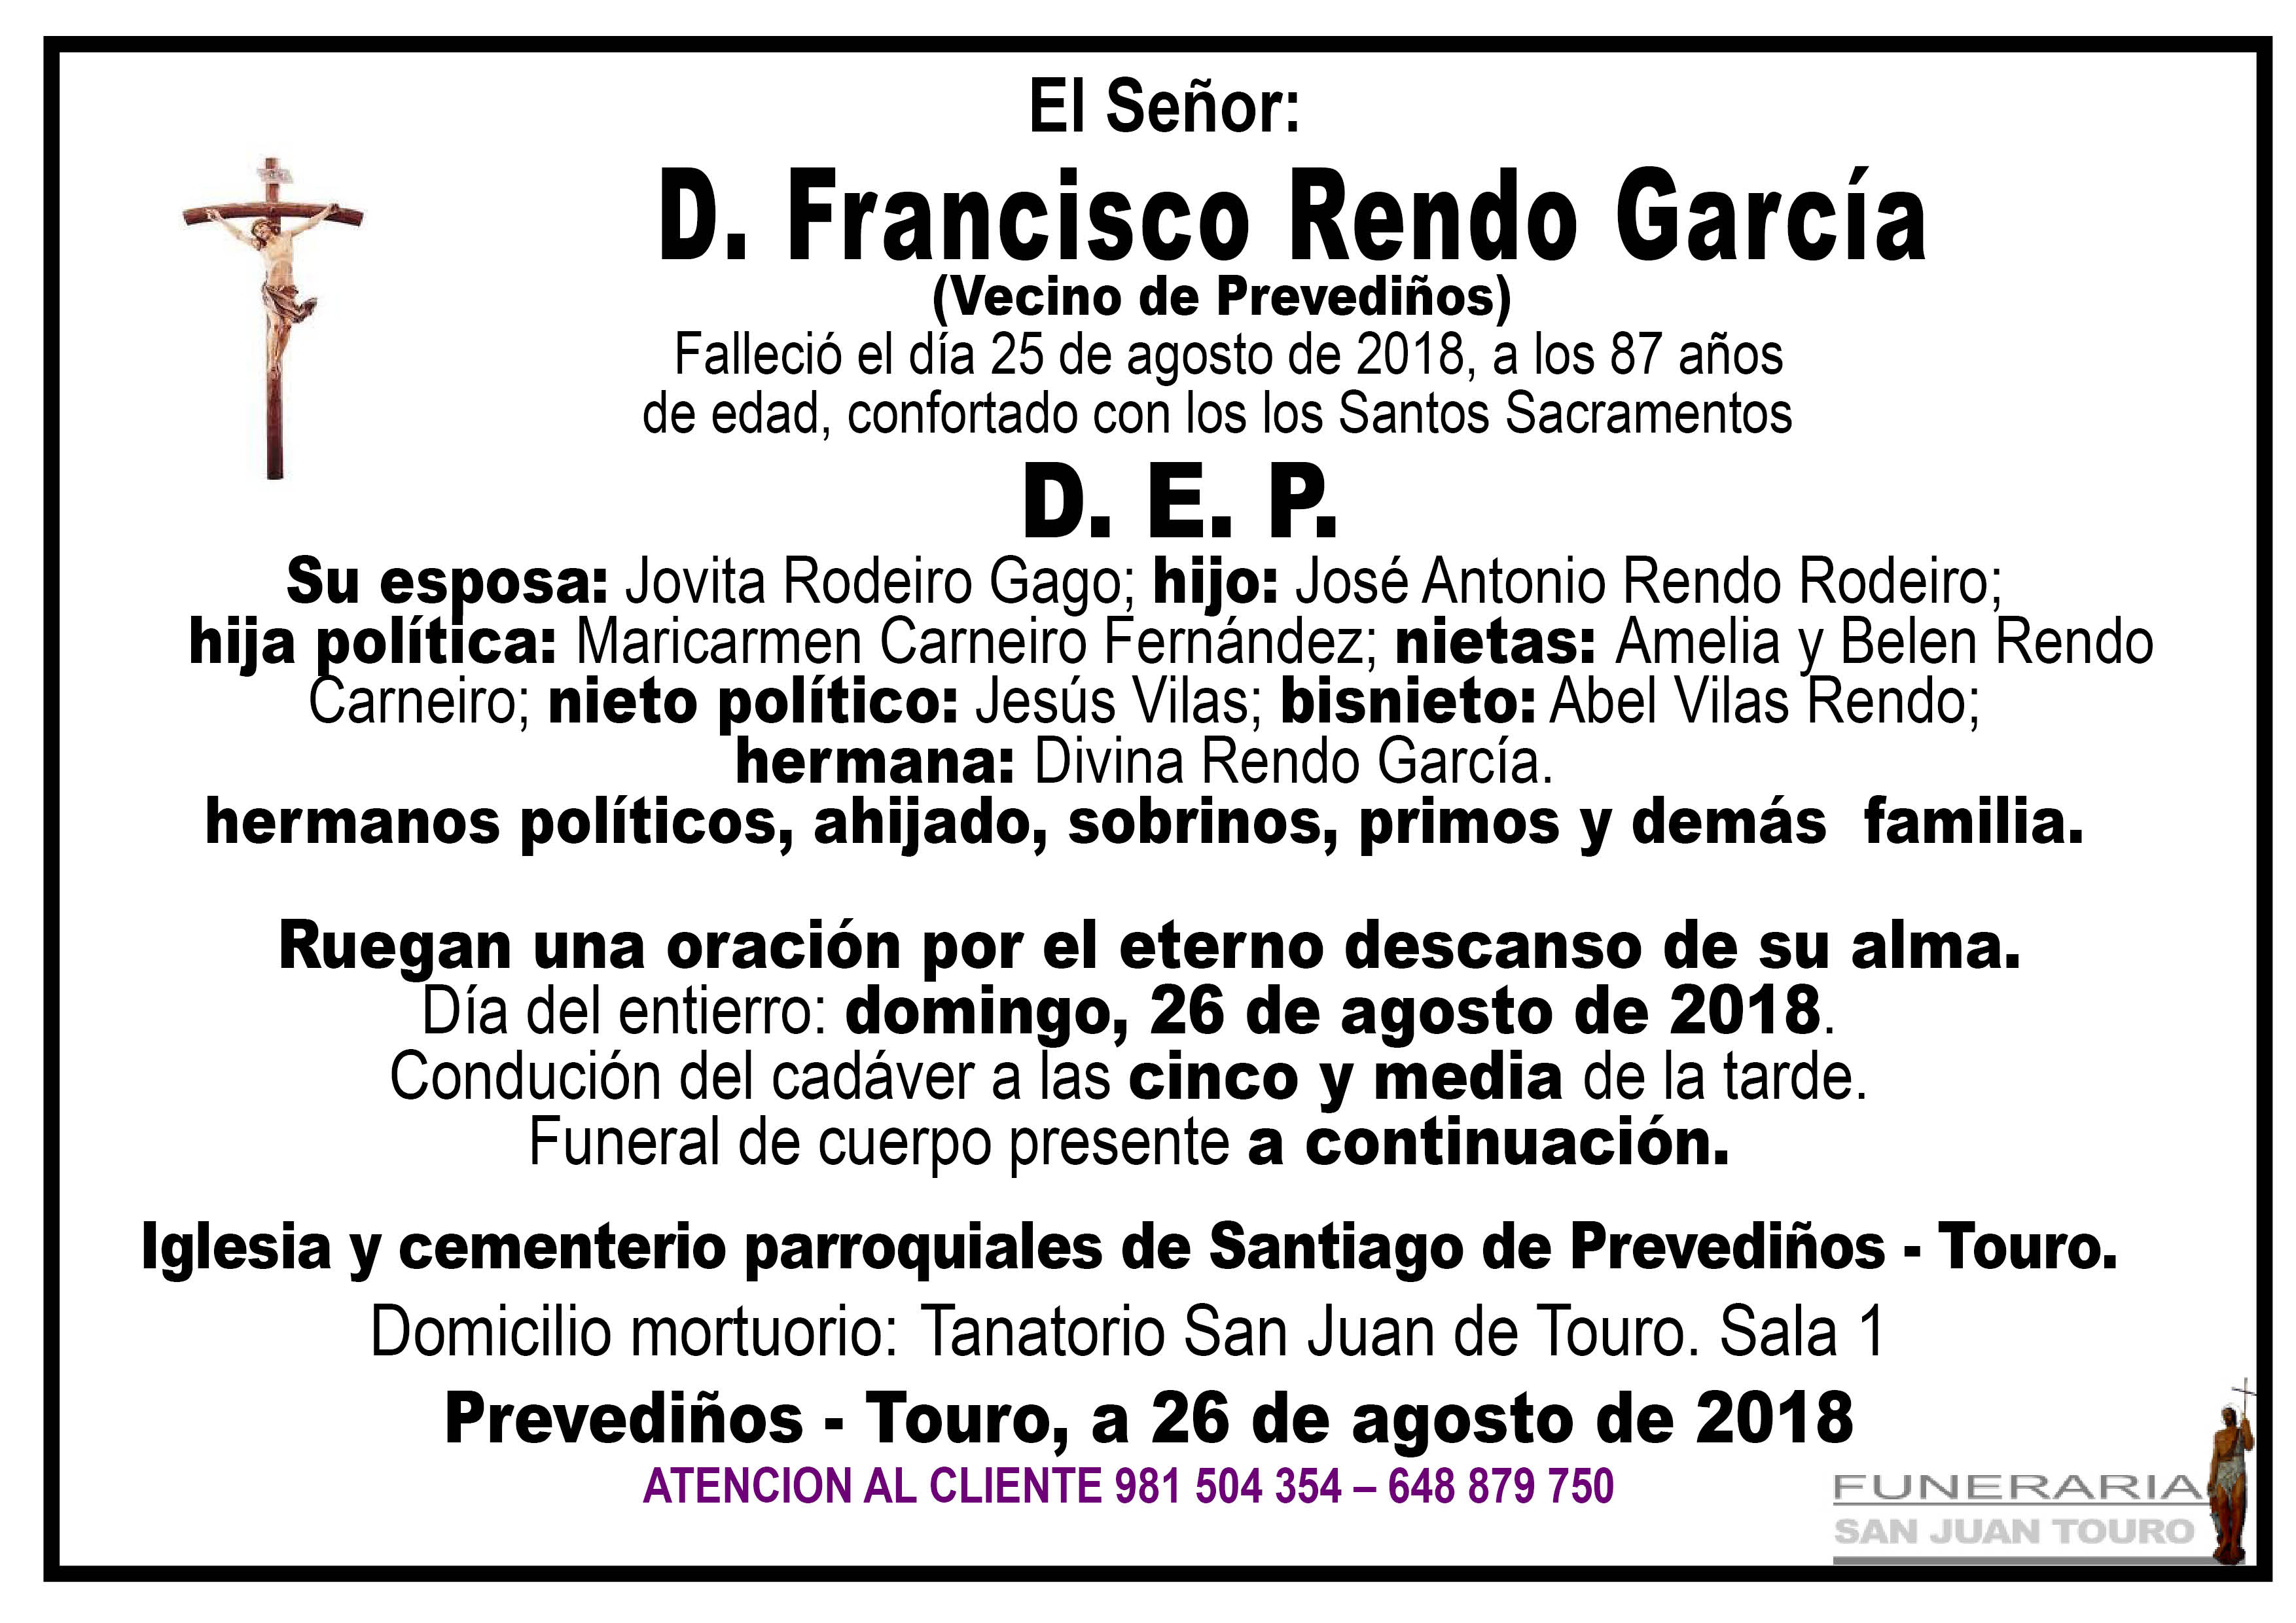 Esquela de SEPELIO DE DON FRANCISCO RENDO GARCÍA